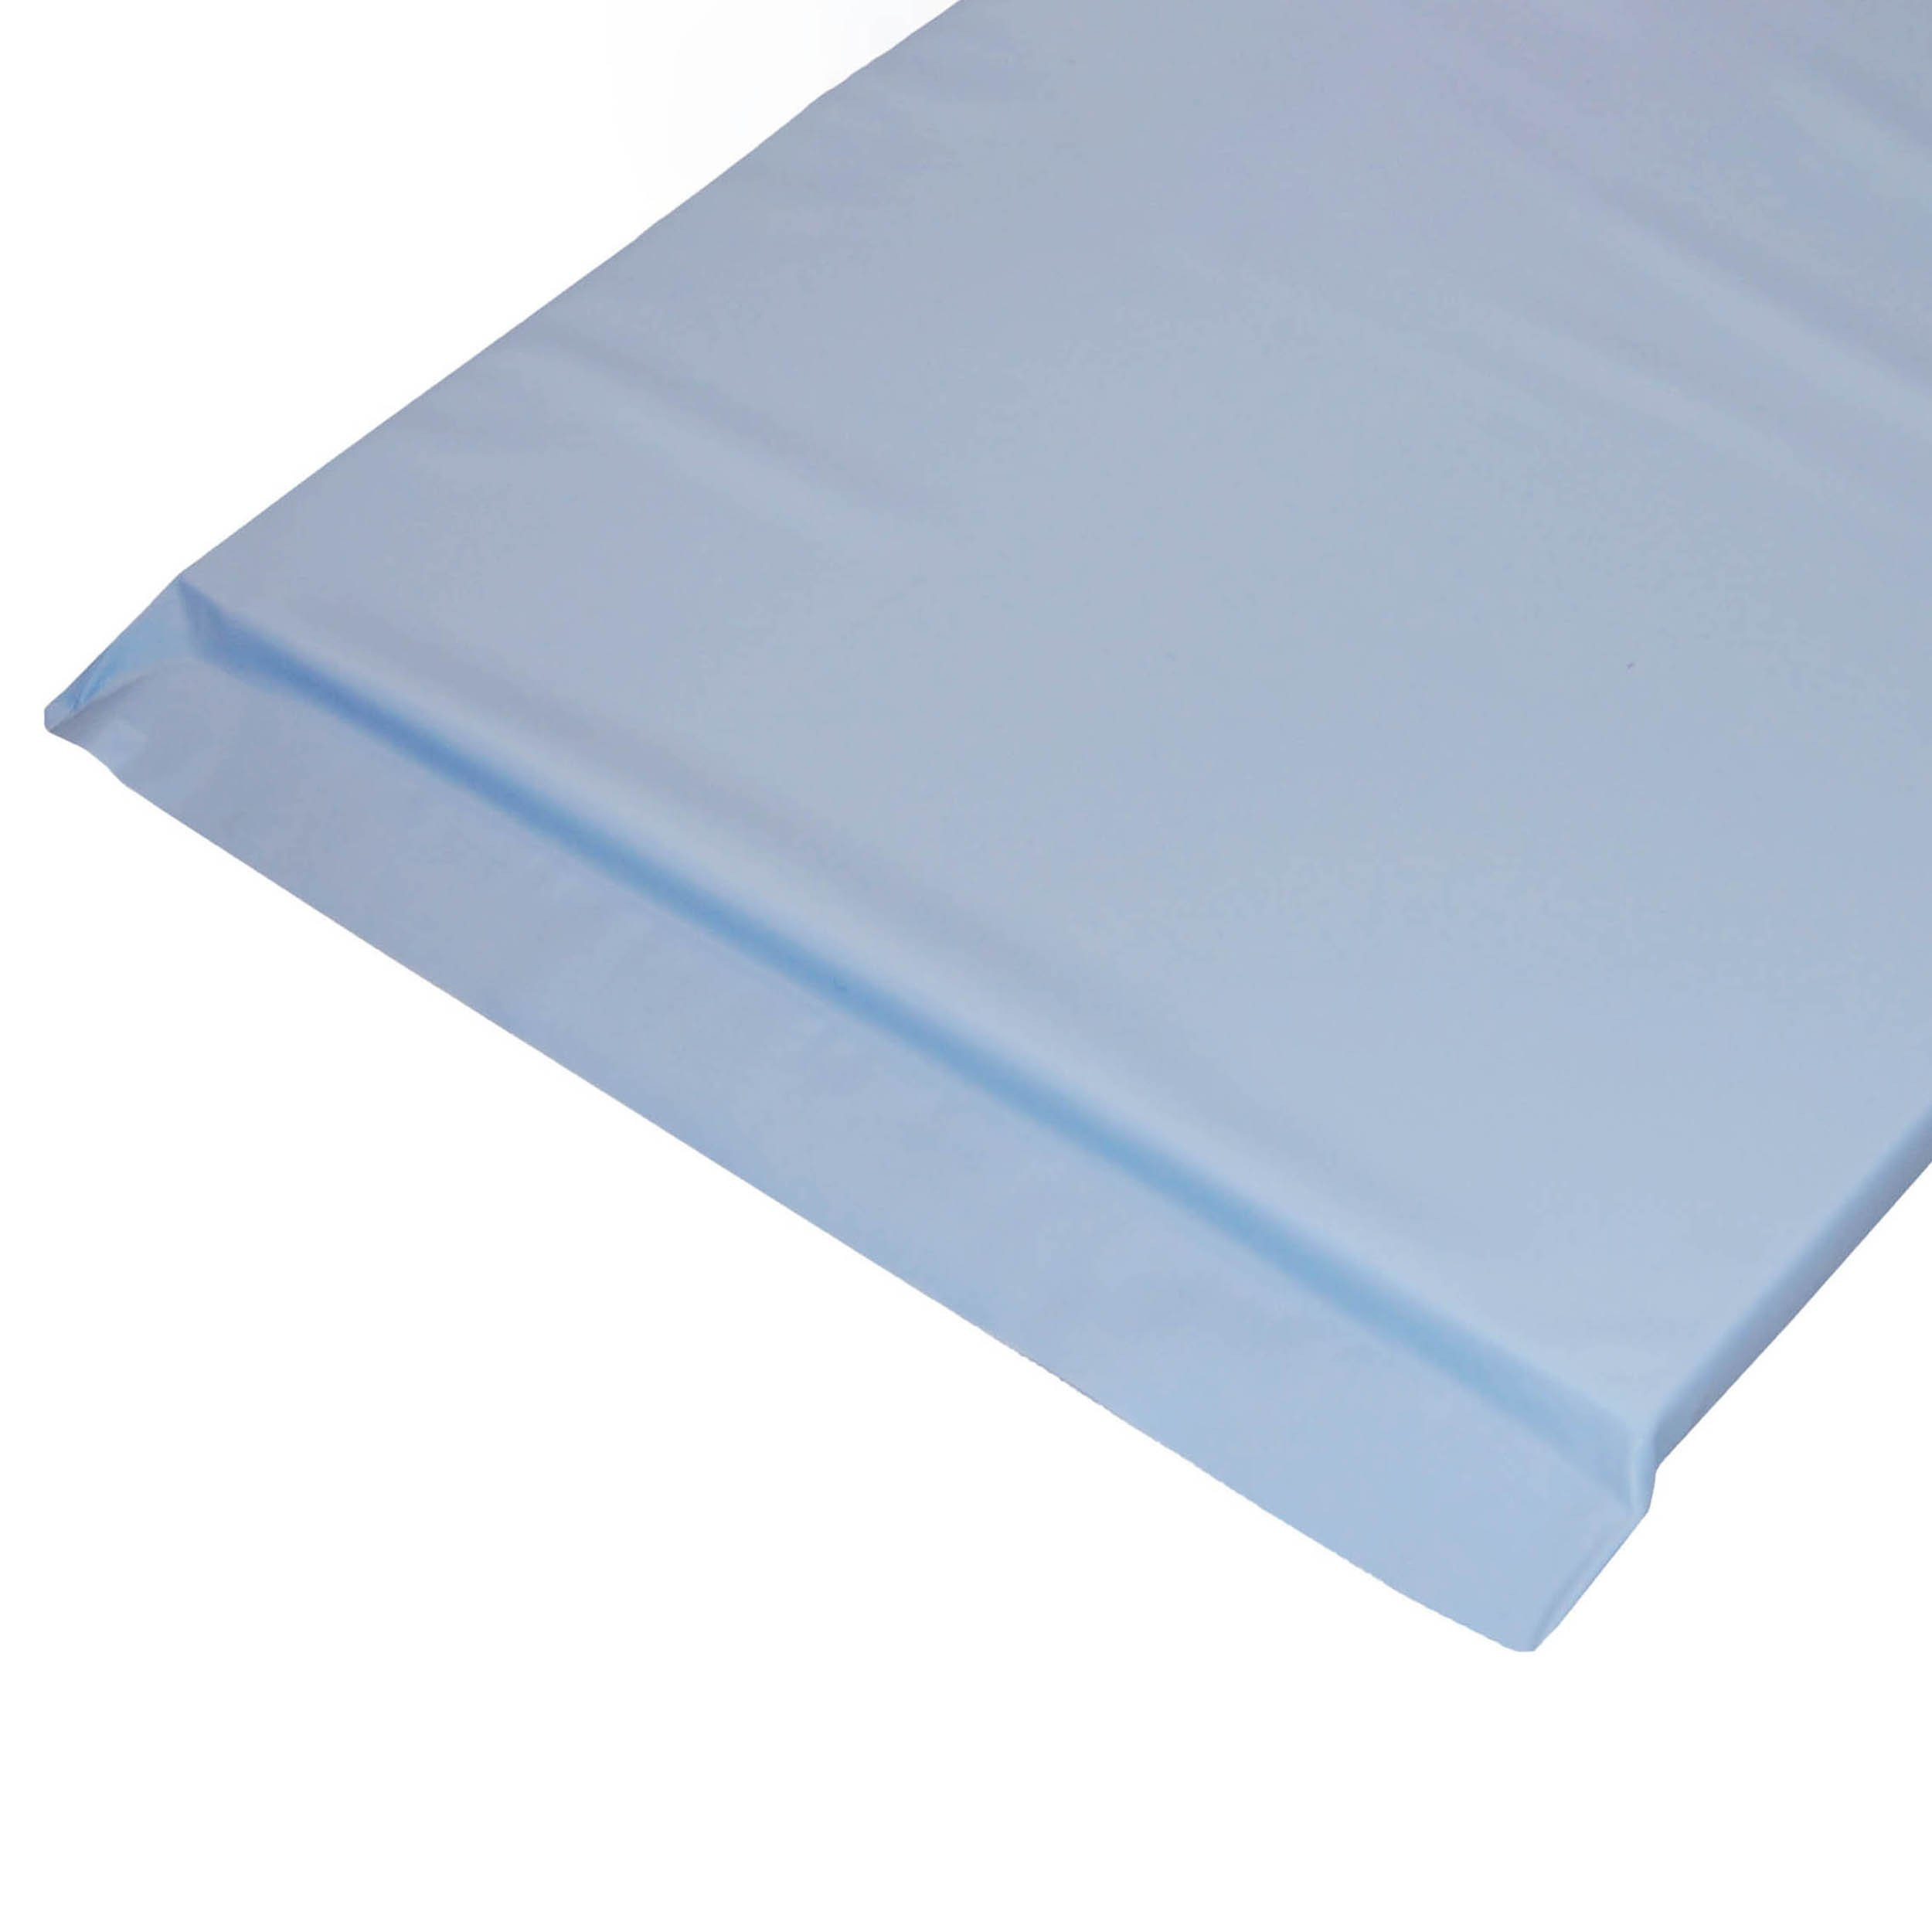 Economy Standard Plus Radiolucent X-Ray Comfort Foam Table Pad - Light Blue Vinyl, No Grommets 80